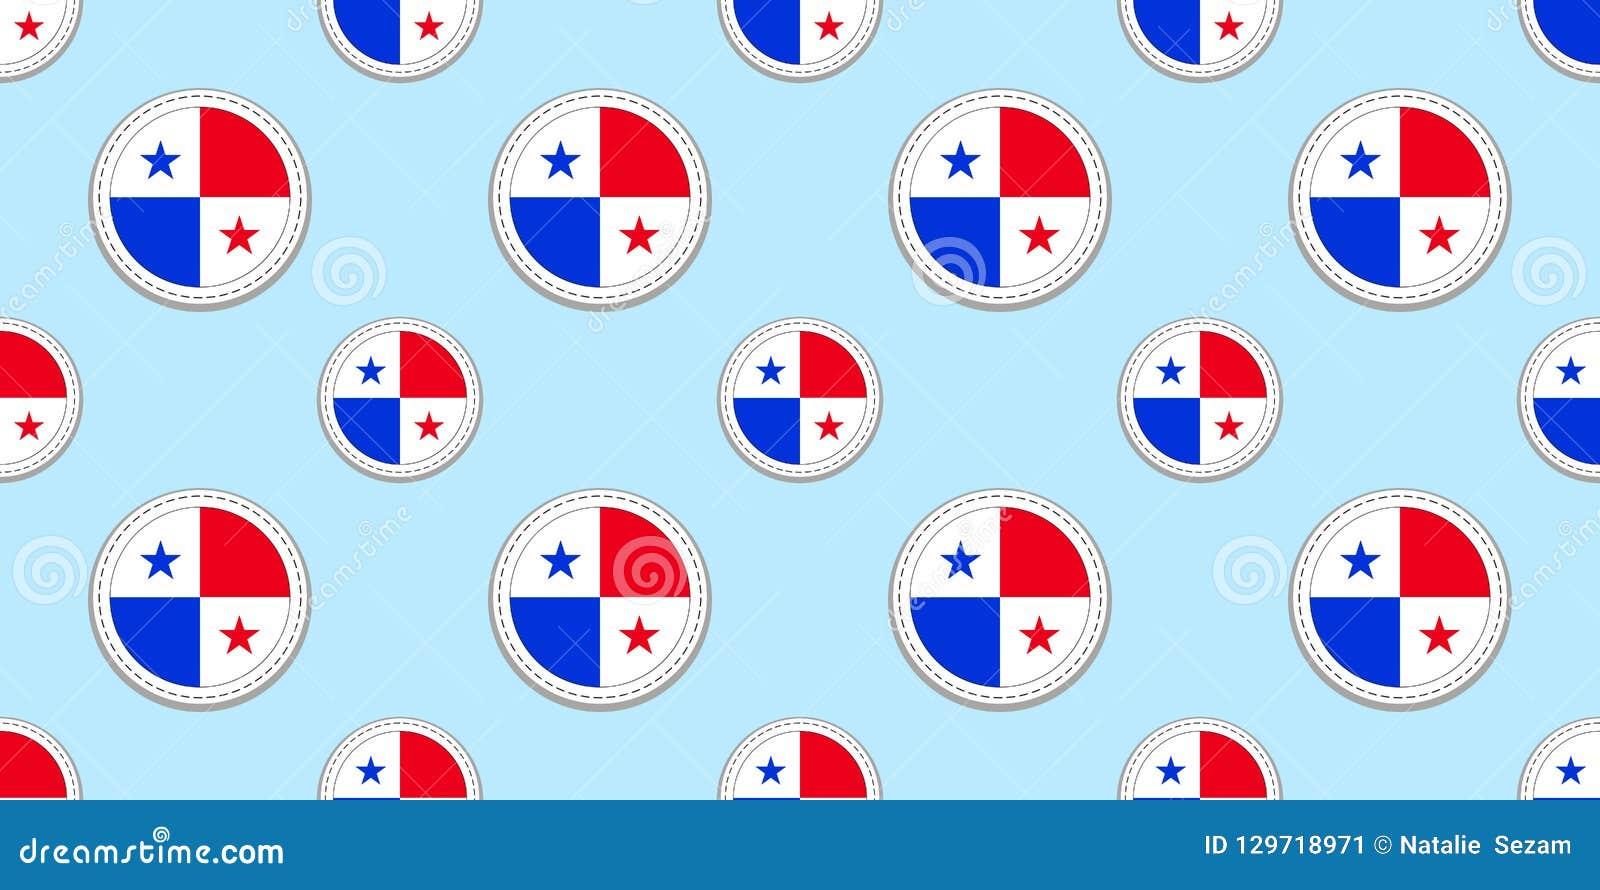 Panama round flag seamless pattern. Panamanian background. Vector circle icons. Geometric symbols.